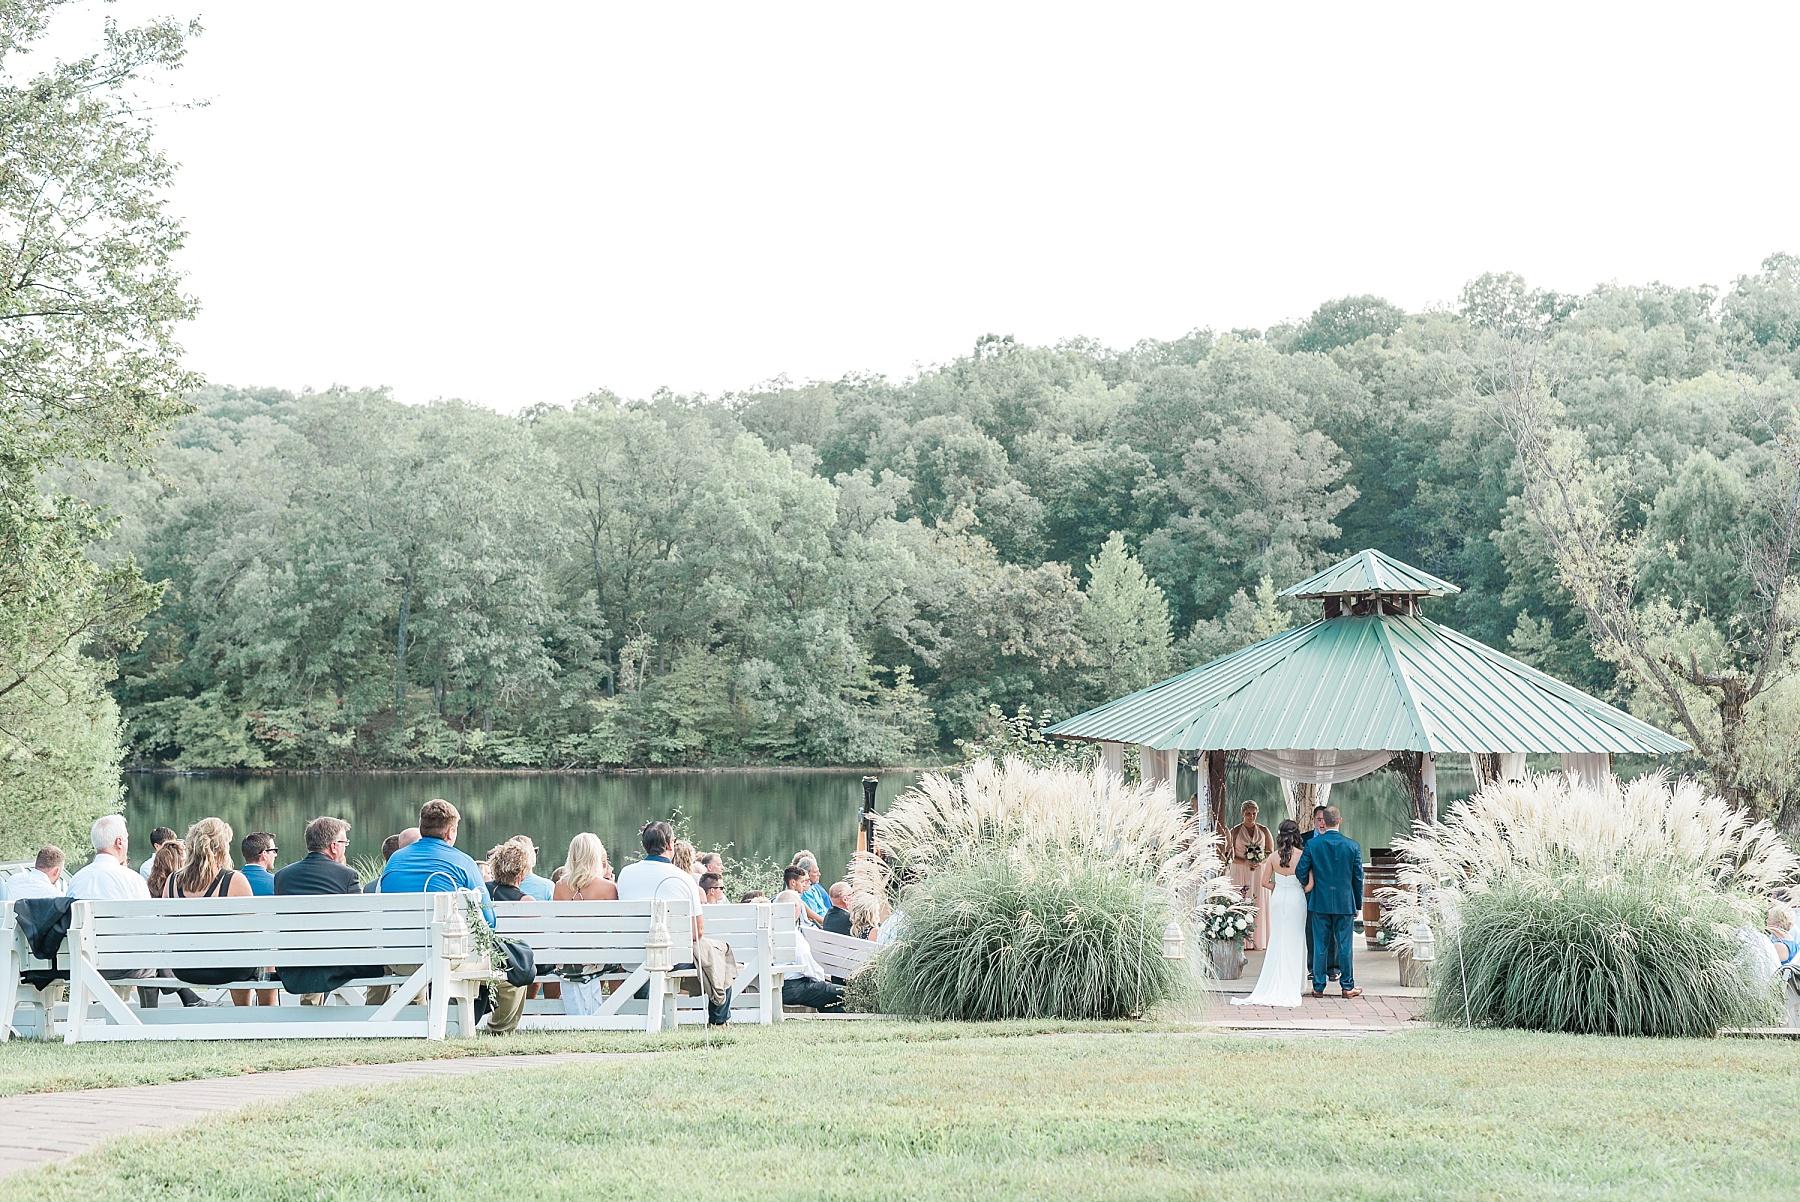 Romantic Summer Sunset Wedding Ceremony at Little Piney Lodge St. Louis Missouri by Kelsi Kliethermes Photography Fine Art Photographer_0009.jpg